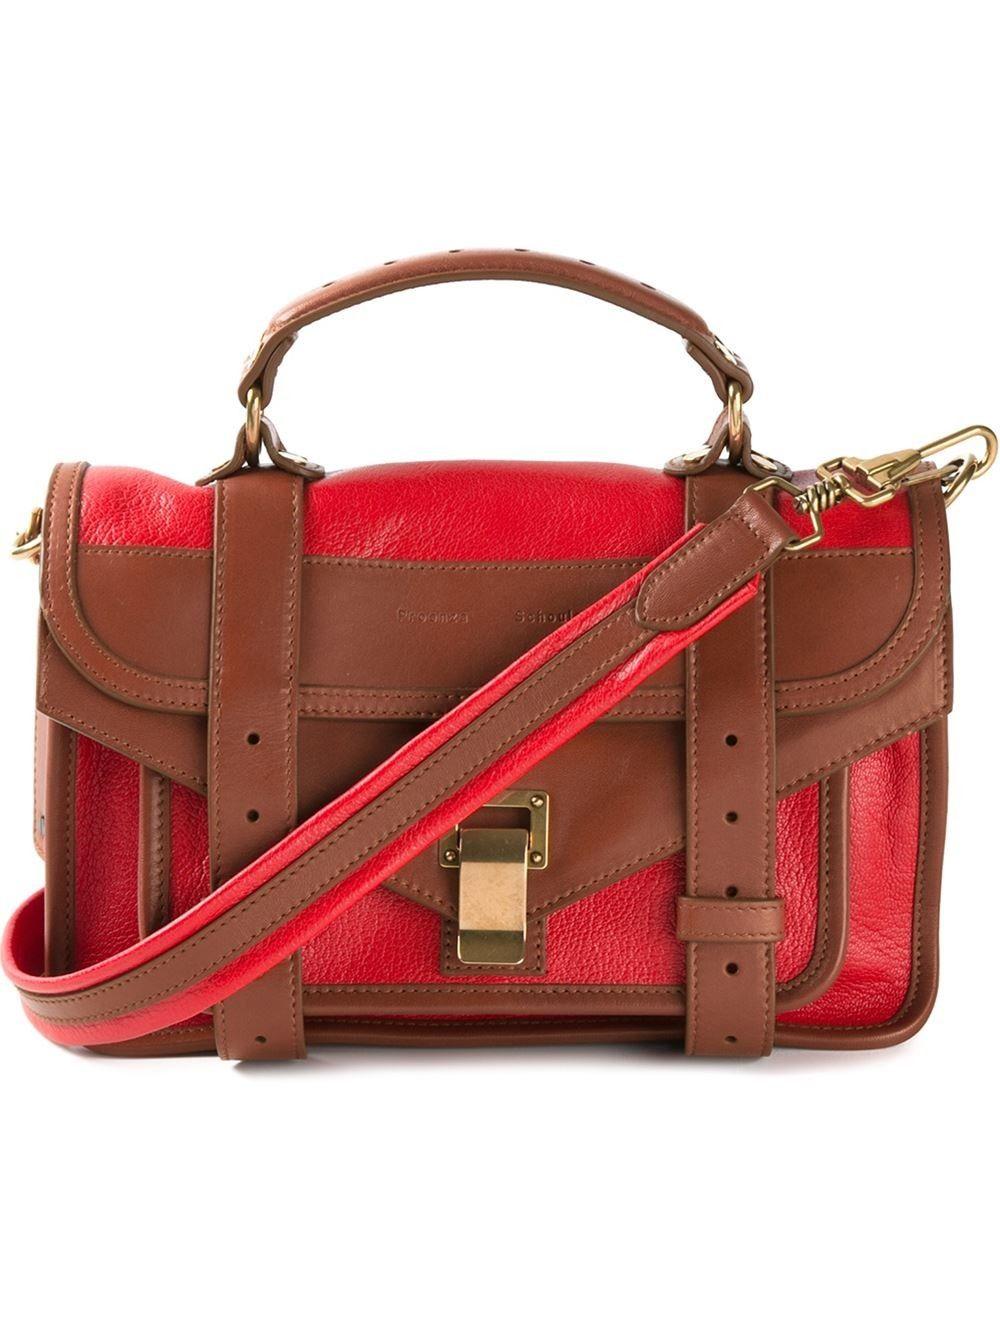 2a35de1ea PROENZA SCHOULER Tiny 'Ps1' Satchel. #proenzaschouler #bags #shoulder bags  #hand bags #leather #satchel #